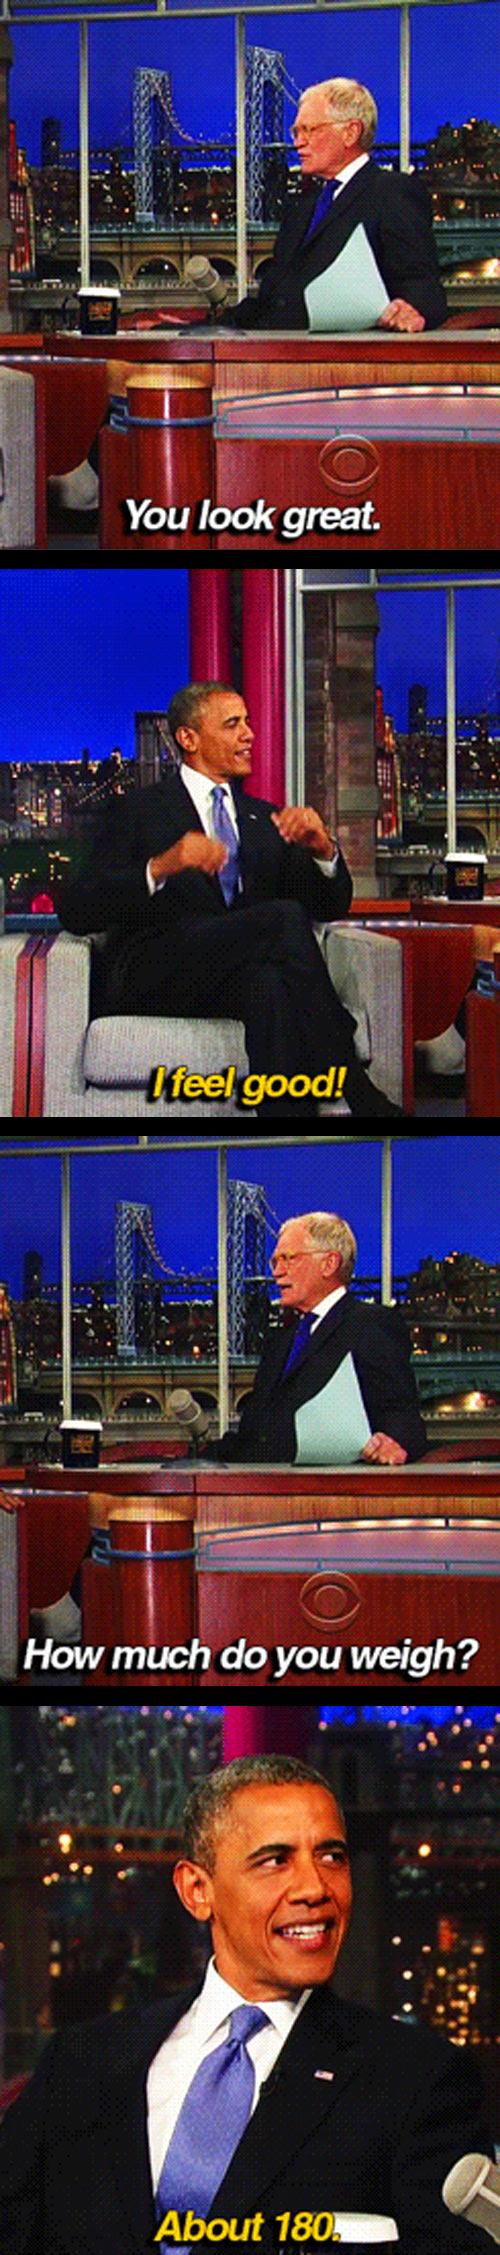 Obama TV interview